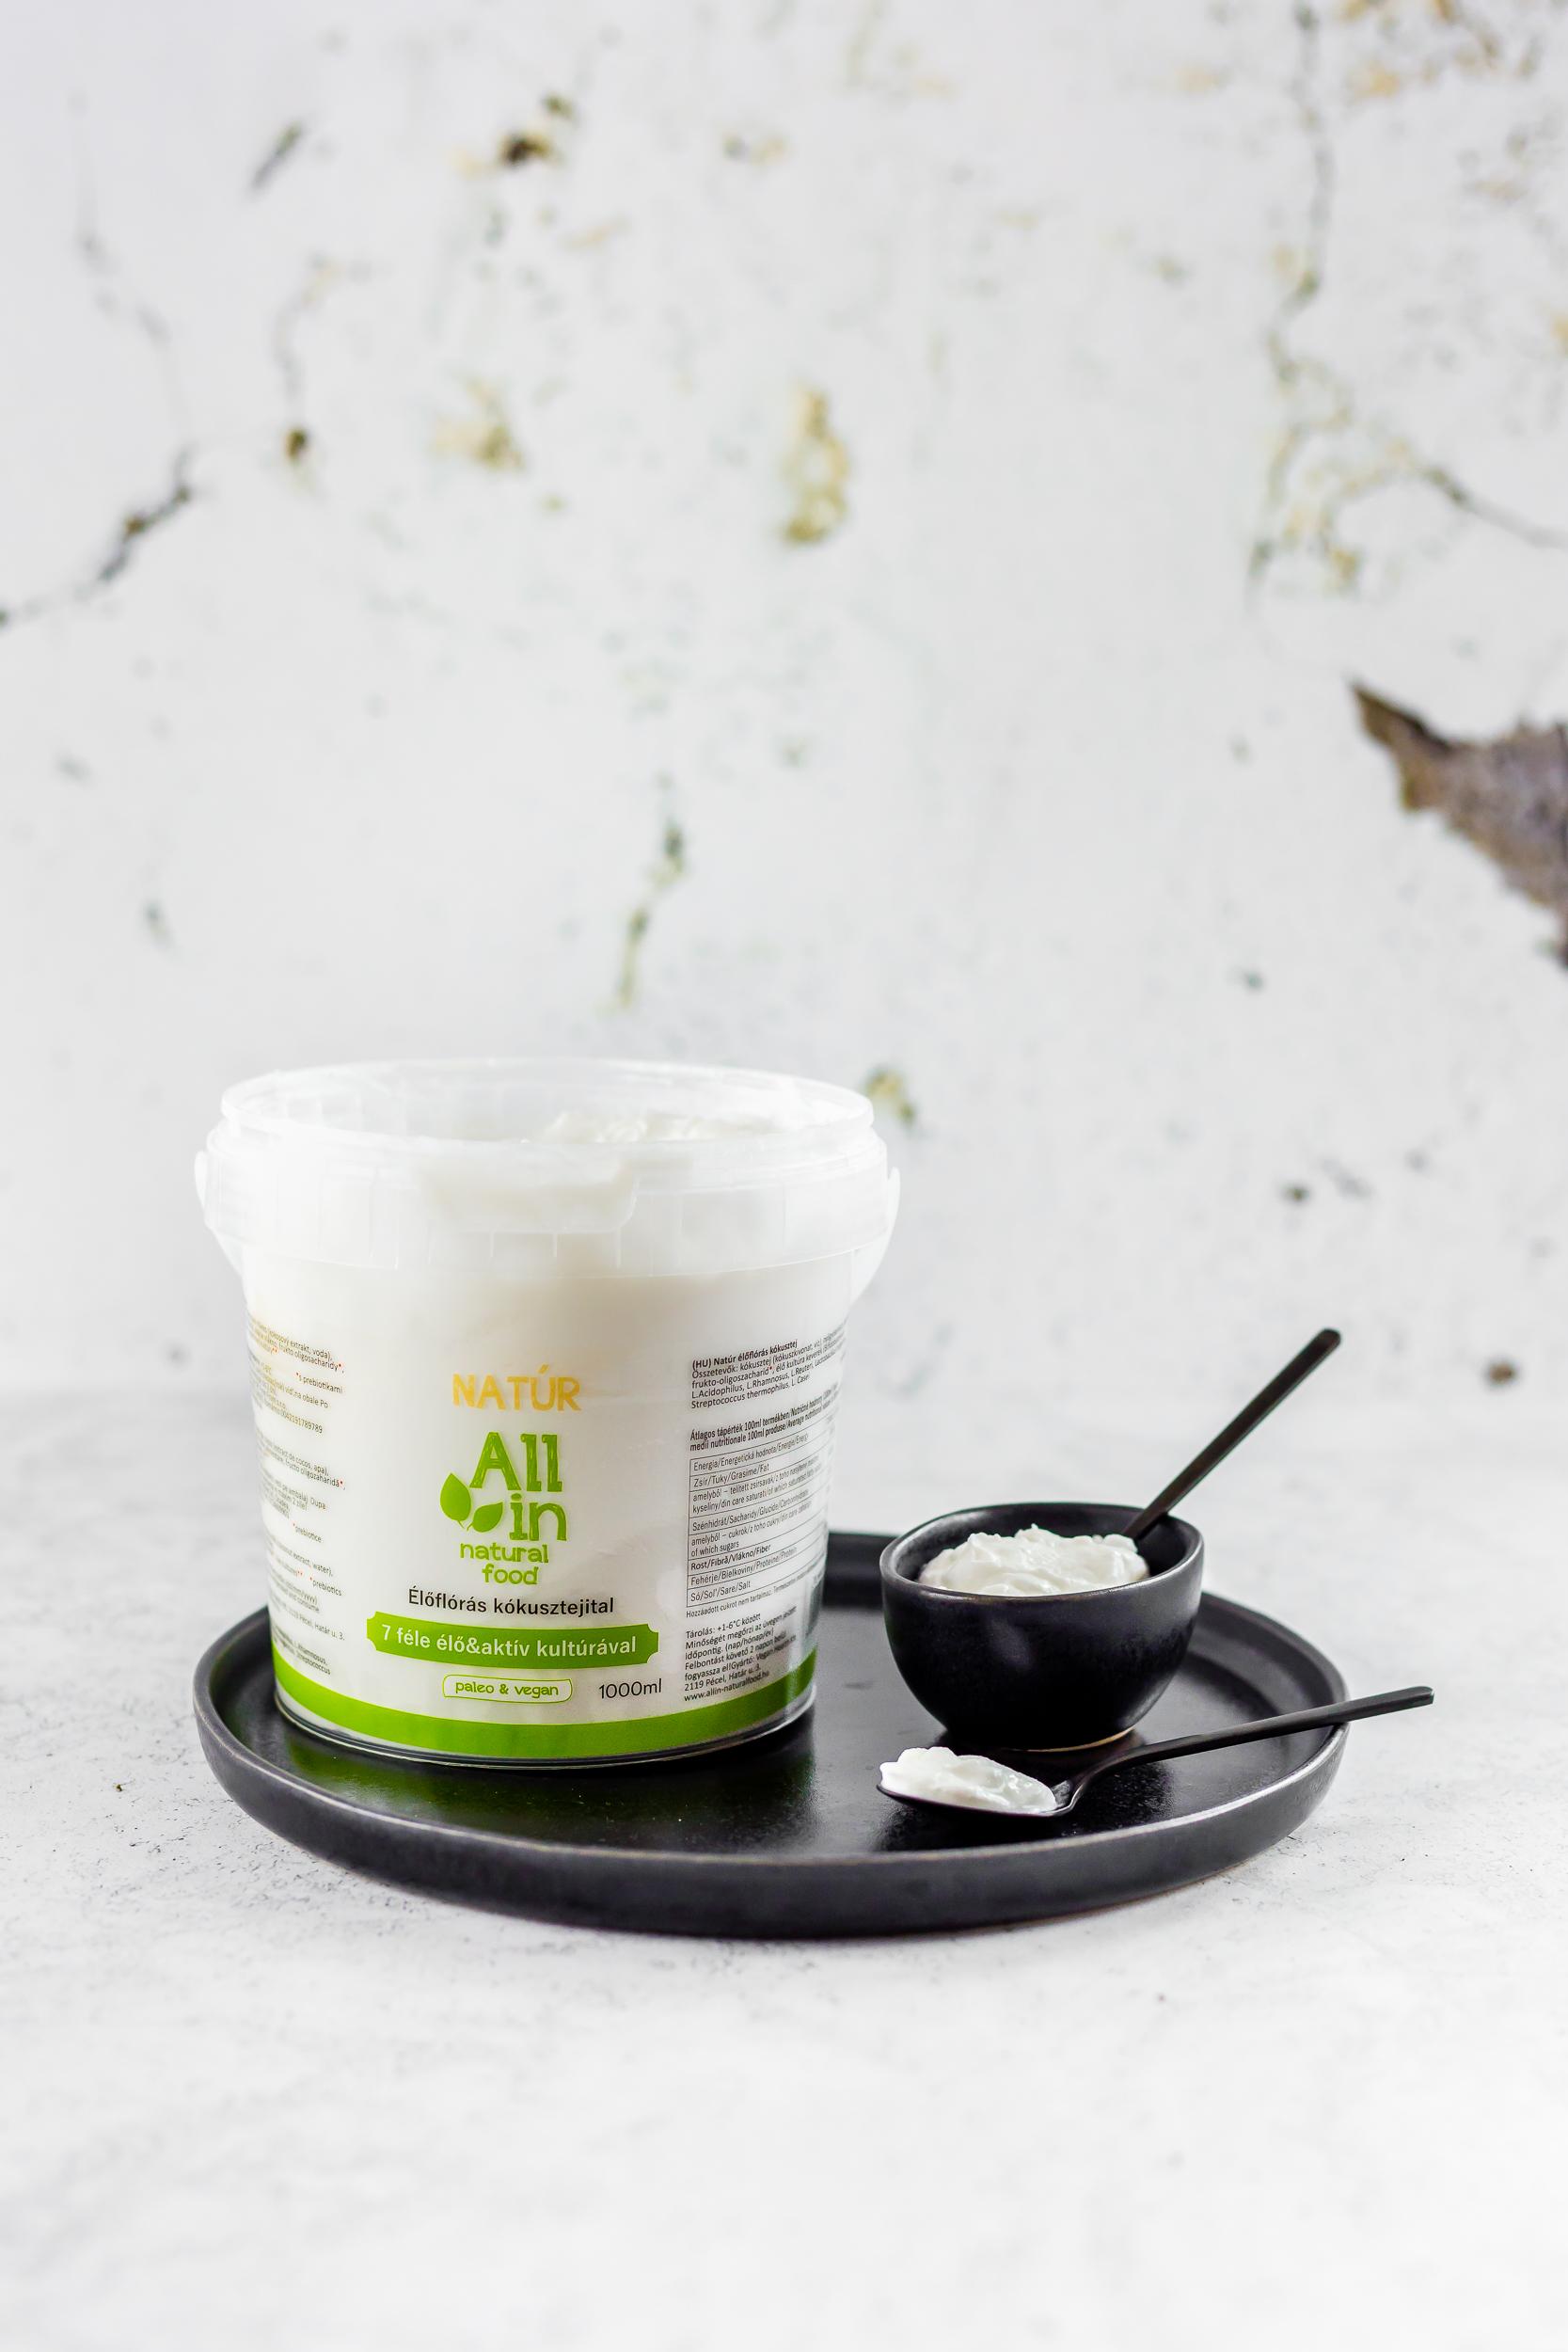 ALL IN natural food - Élőflórás kókuszjoghurt 1000ml